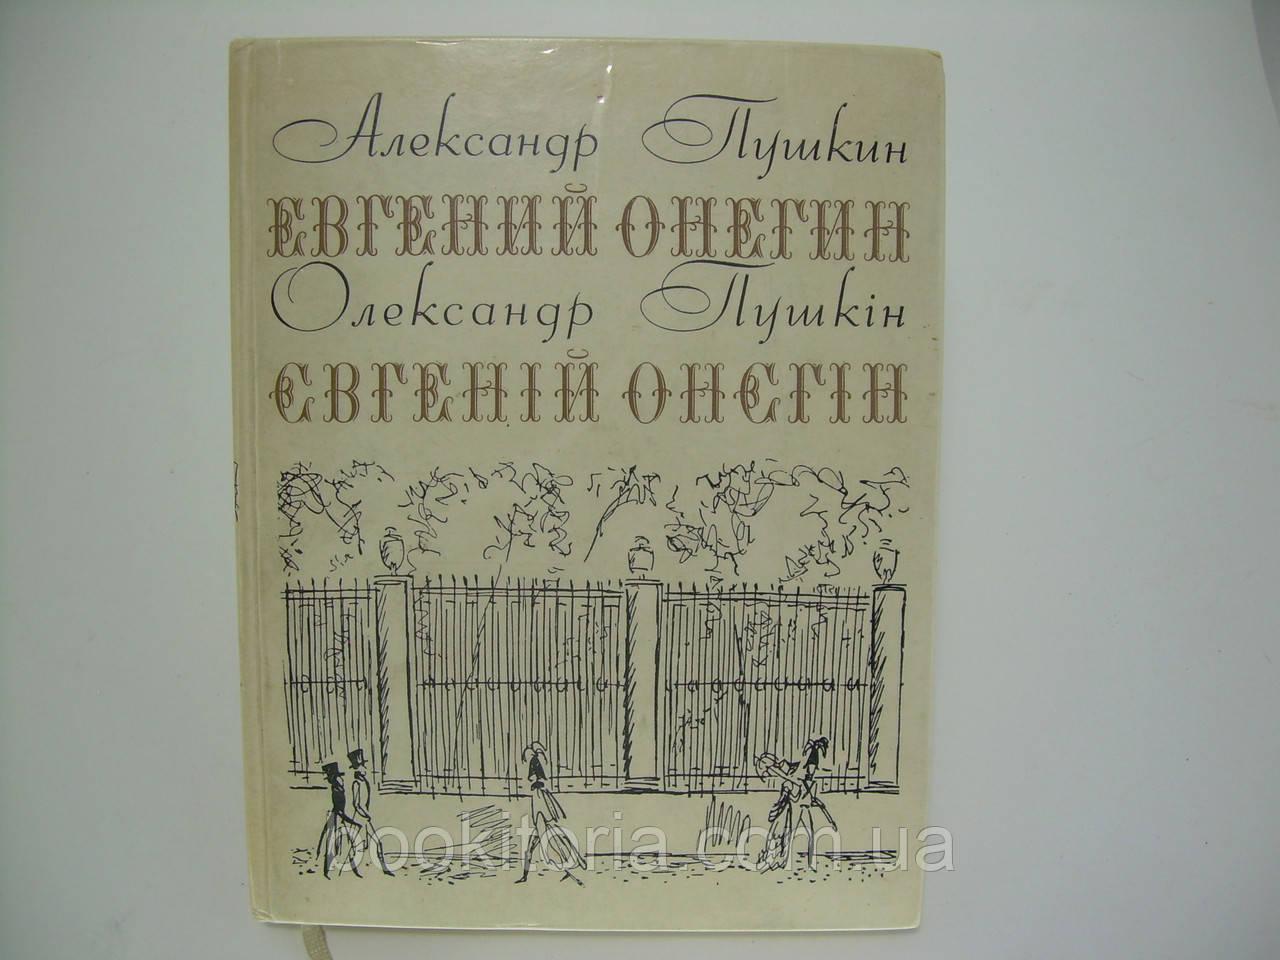 Пушкин А. Евгений Онегин, Пушкін О. Євгеній Онегін (б/у).